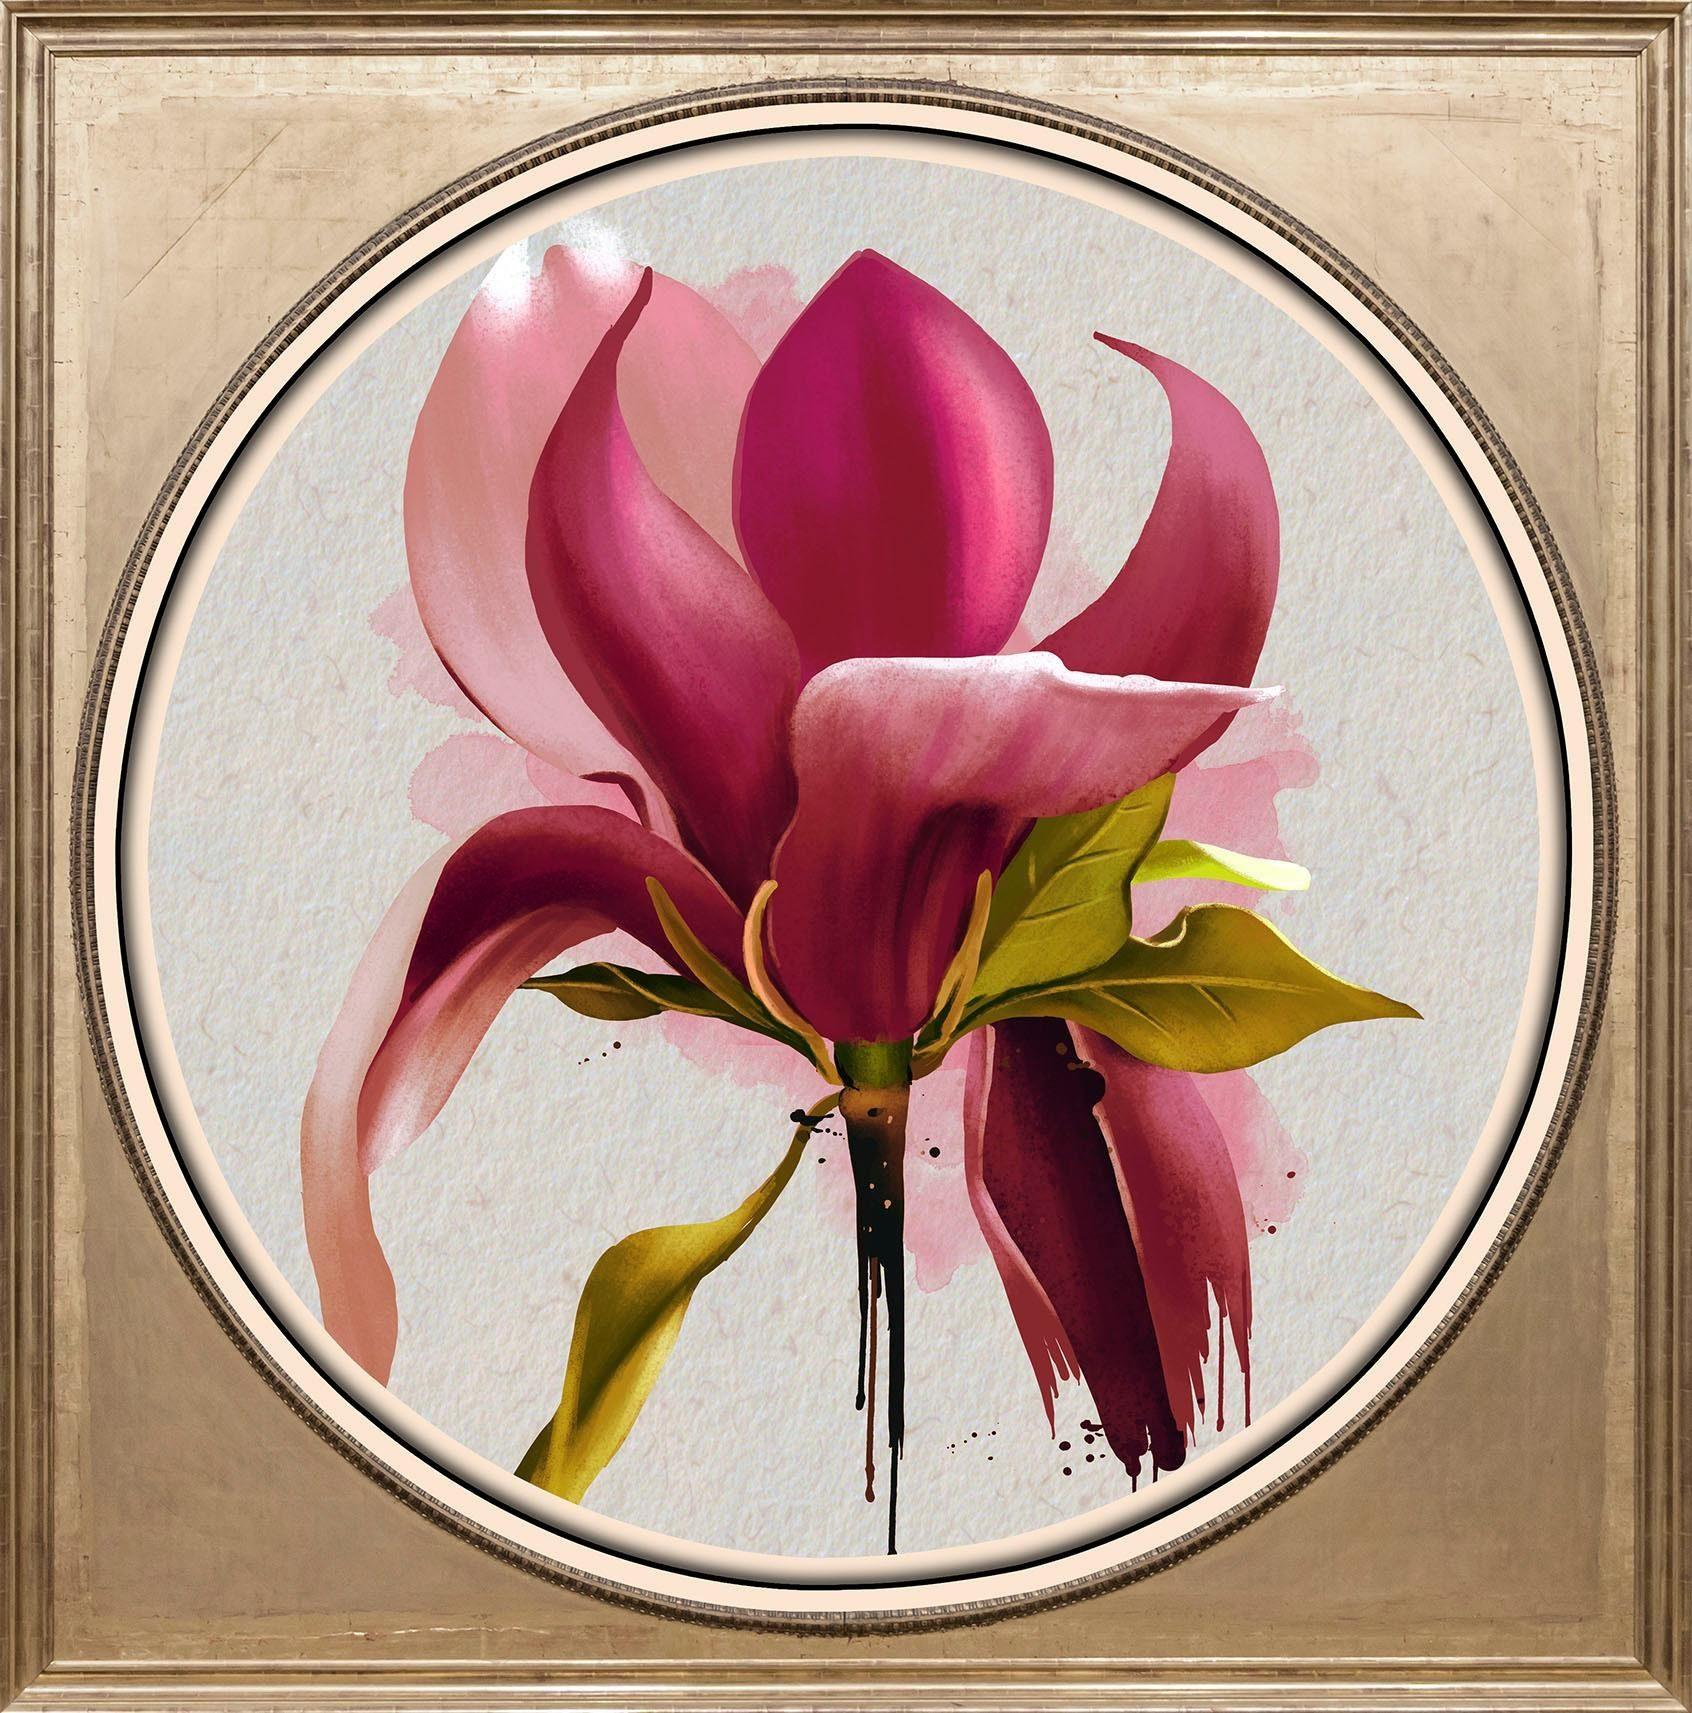 Acrylglasbild »Magnolie«